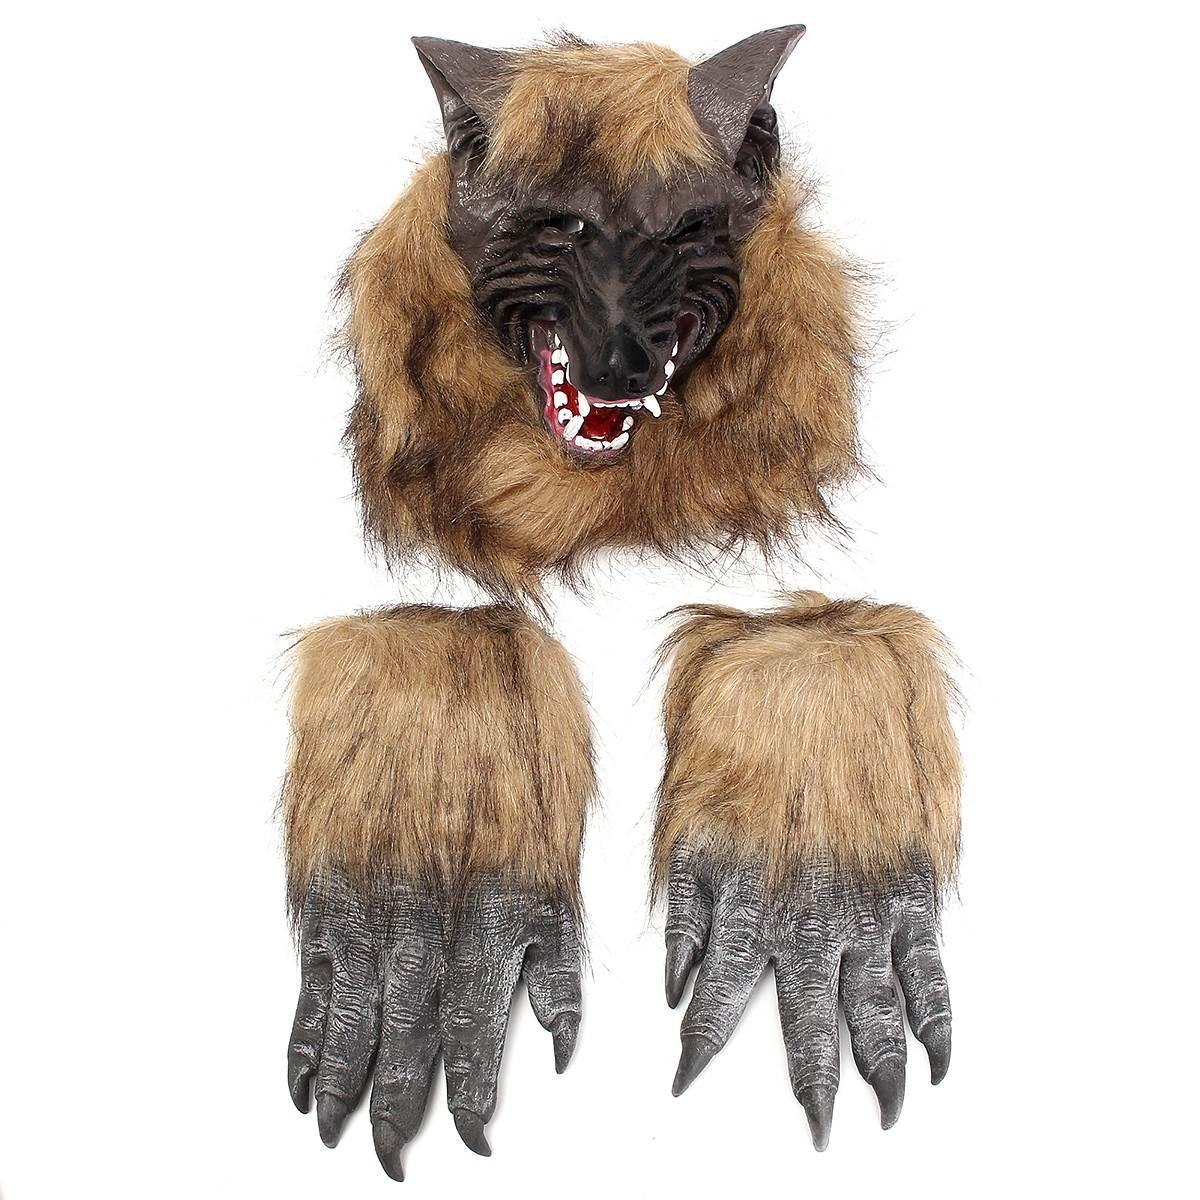 Cabeza de animal manos guantes lobo látex máscara de horror de halloween prop co